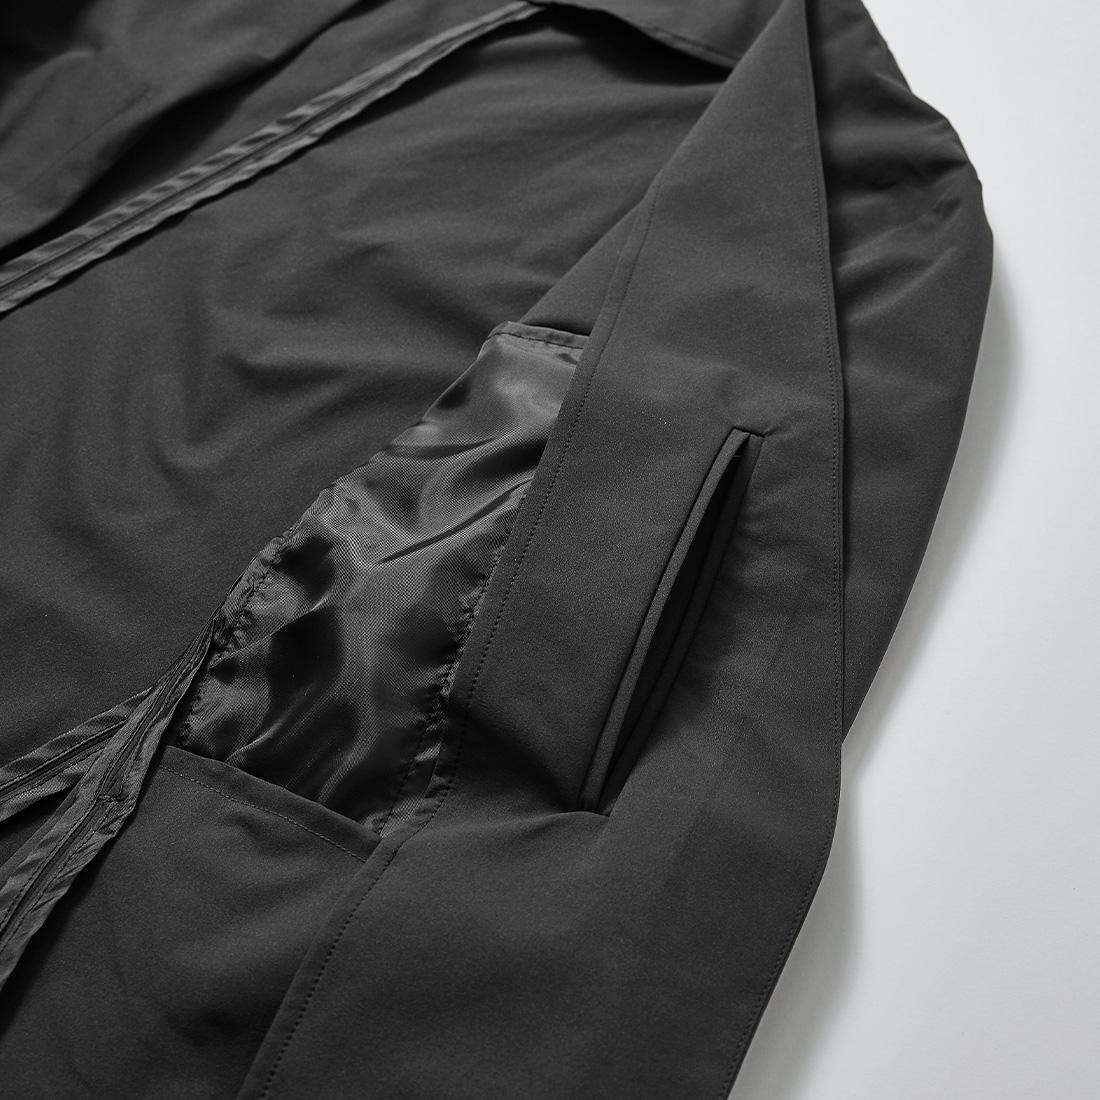 borderless no-collar jacket -male-の商品写真5